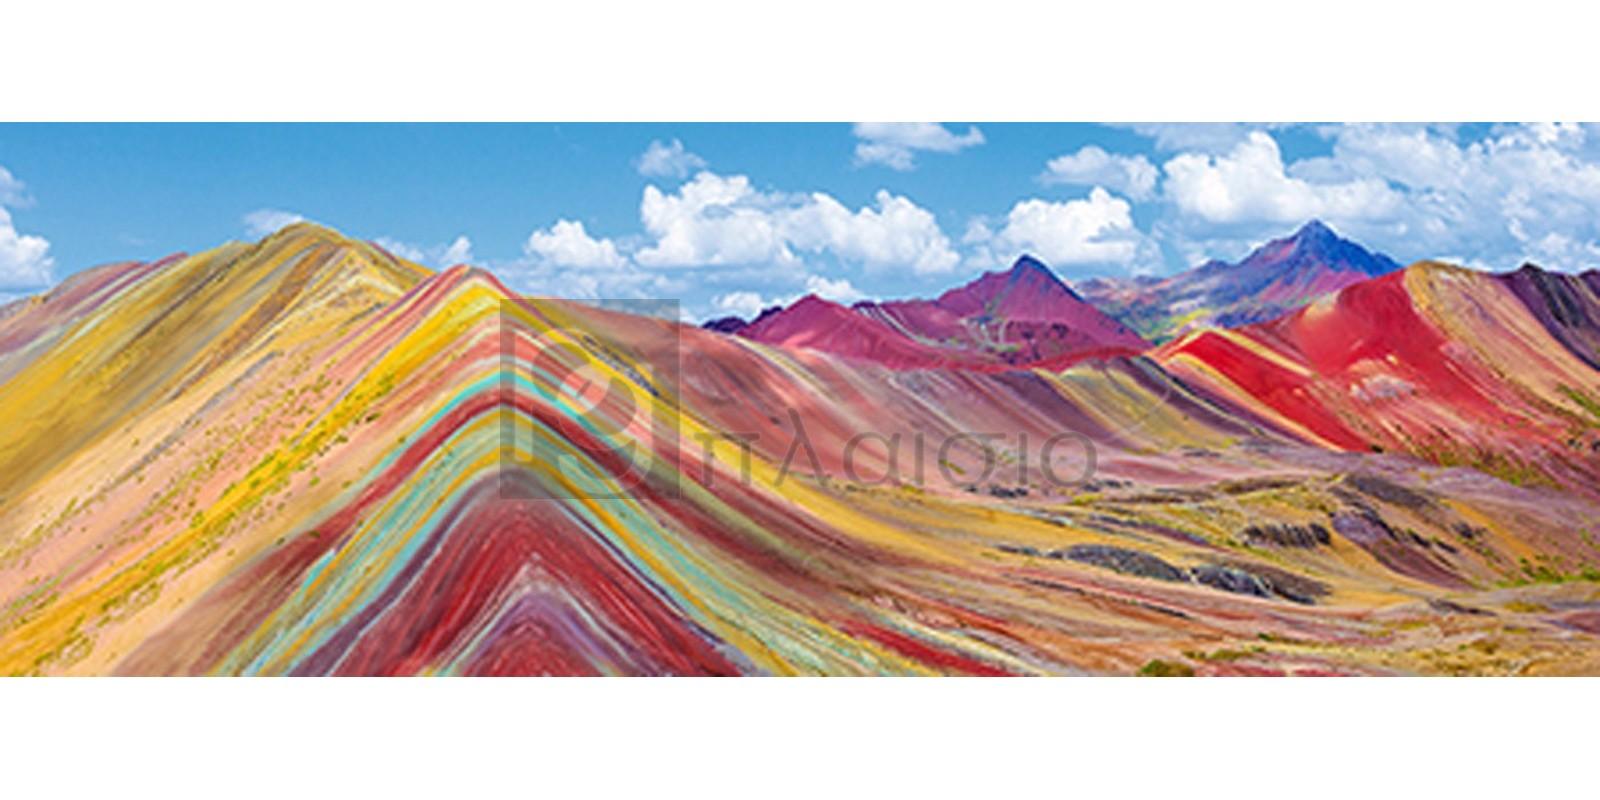 Pangea Images - Vinicunca Rainbow Mountain, Peru